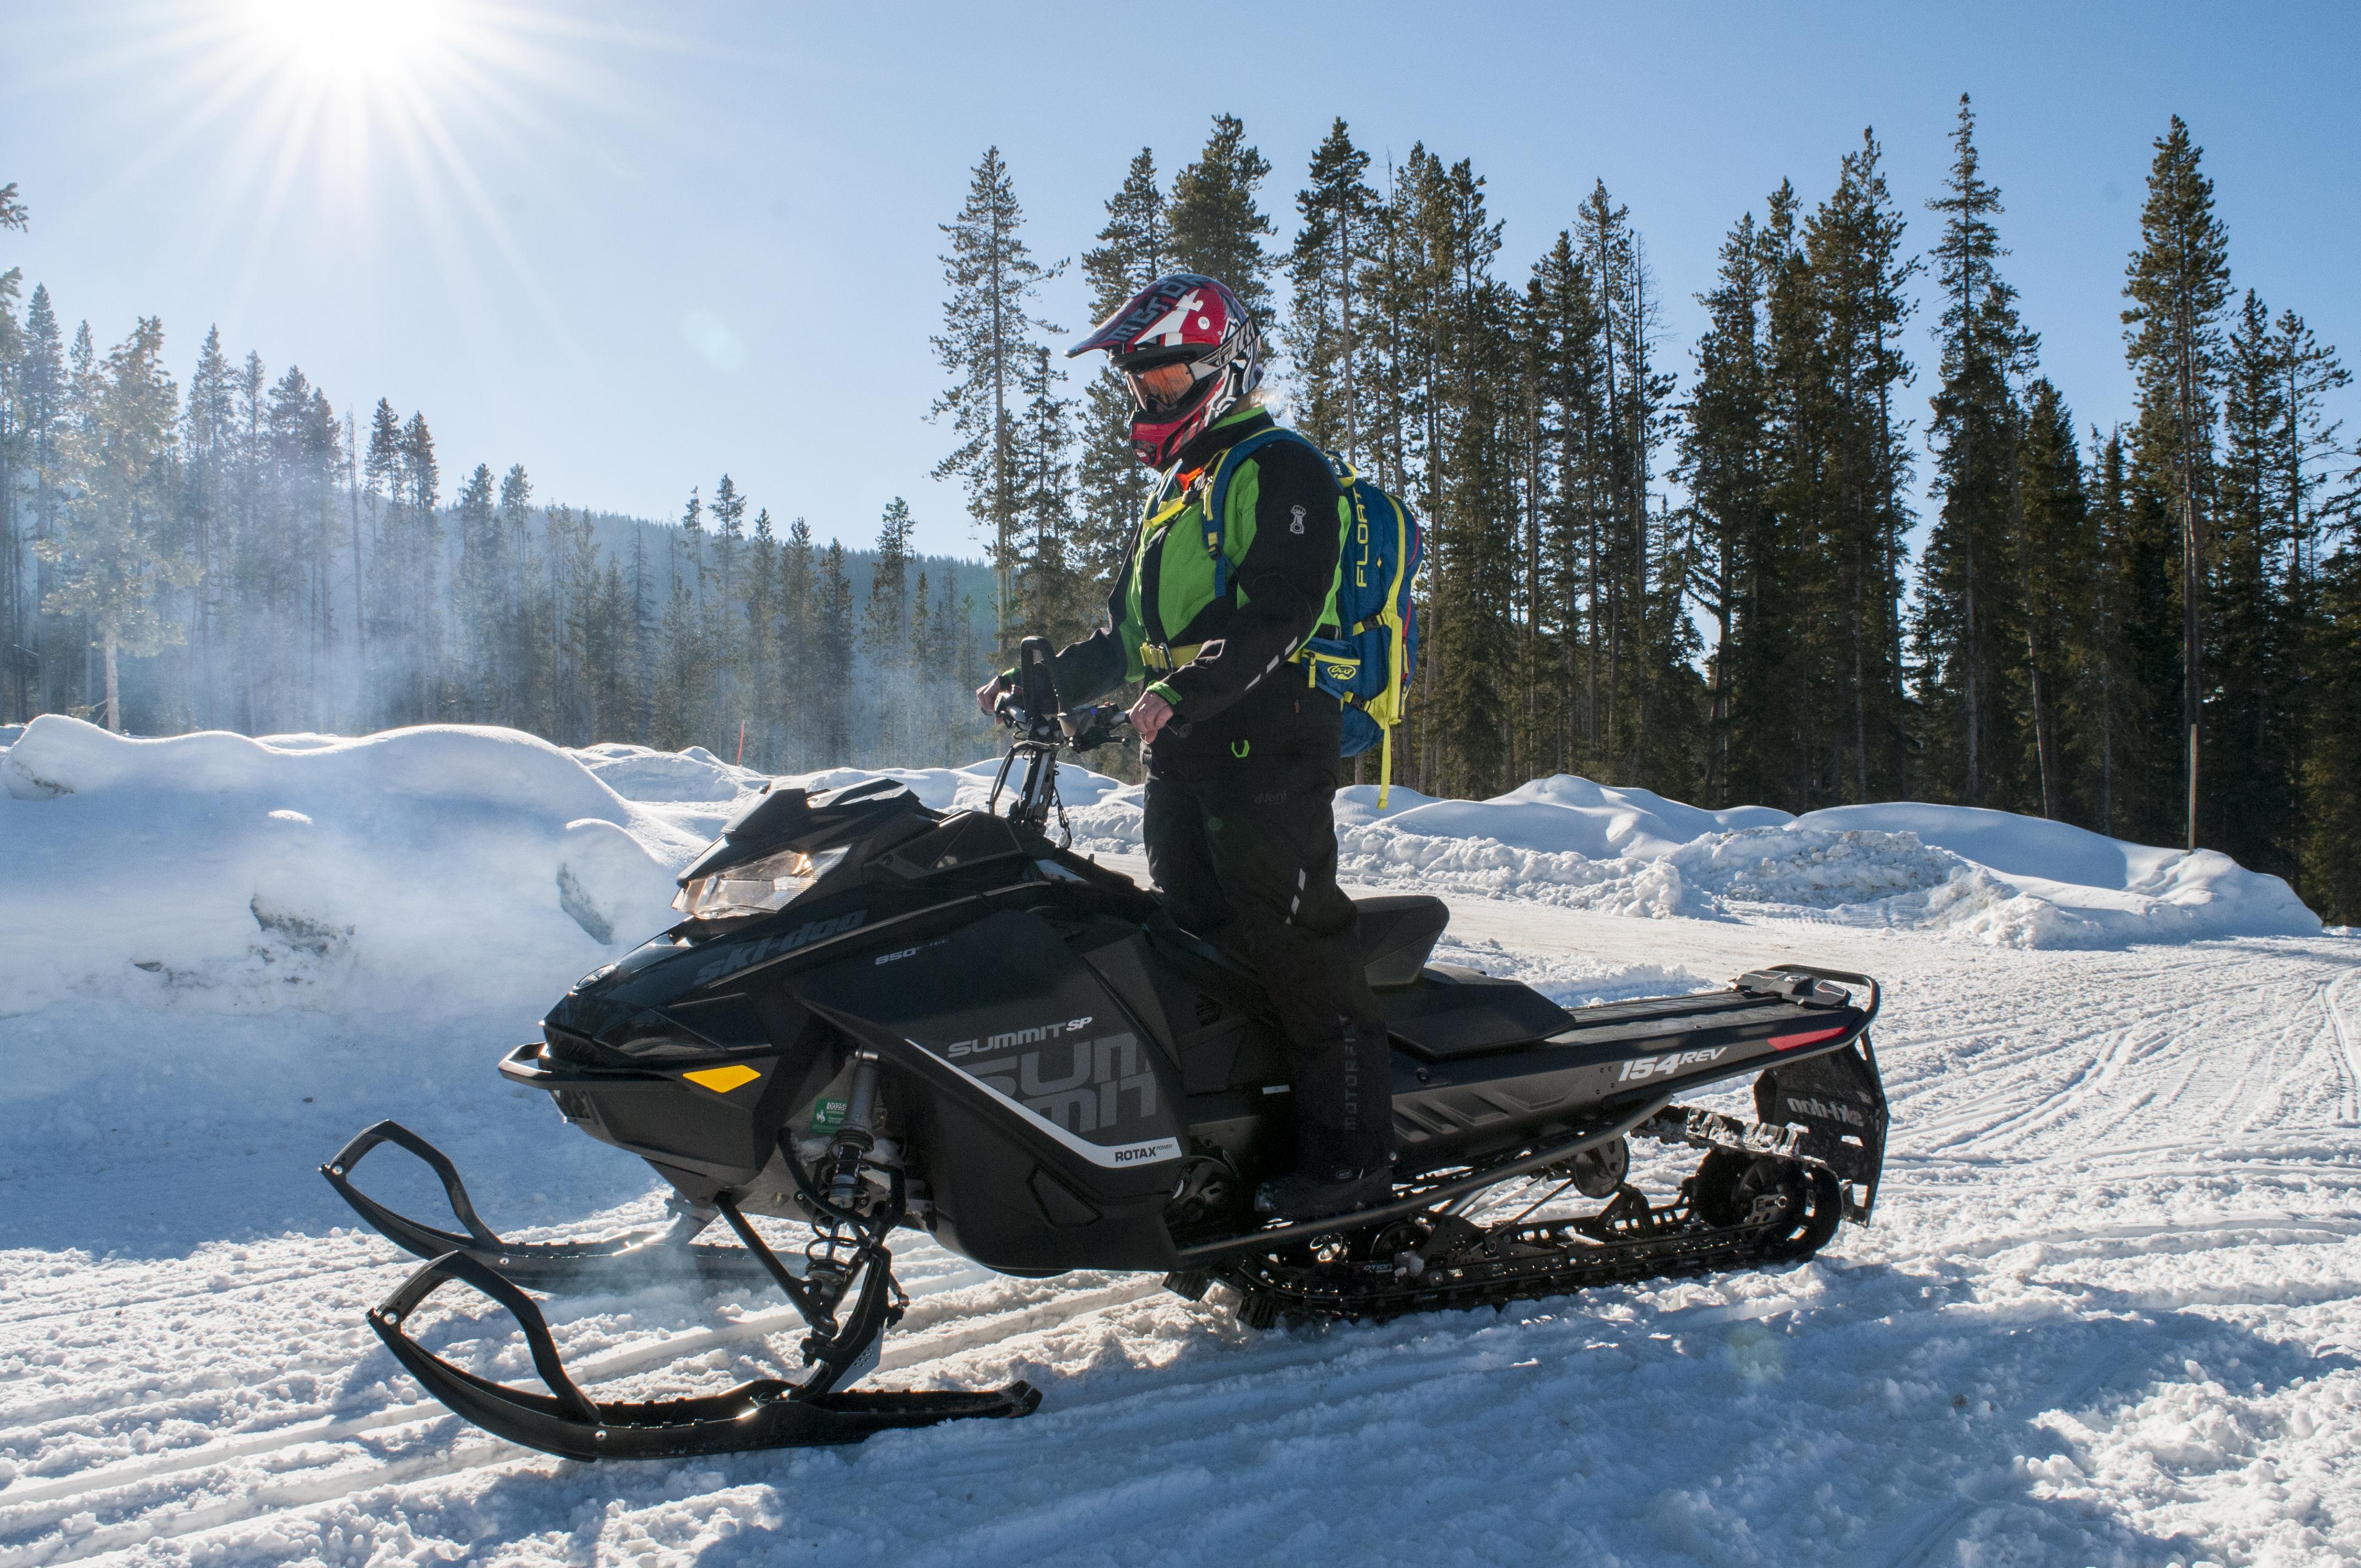 2018 Ski Doo 850 High Performace Snowmobile